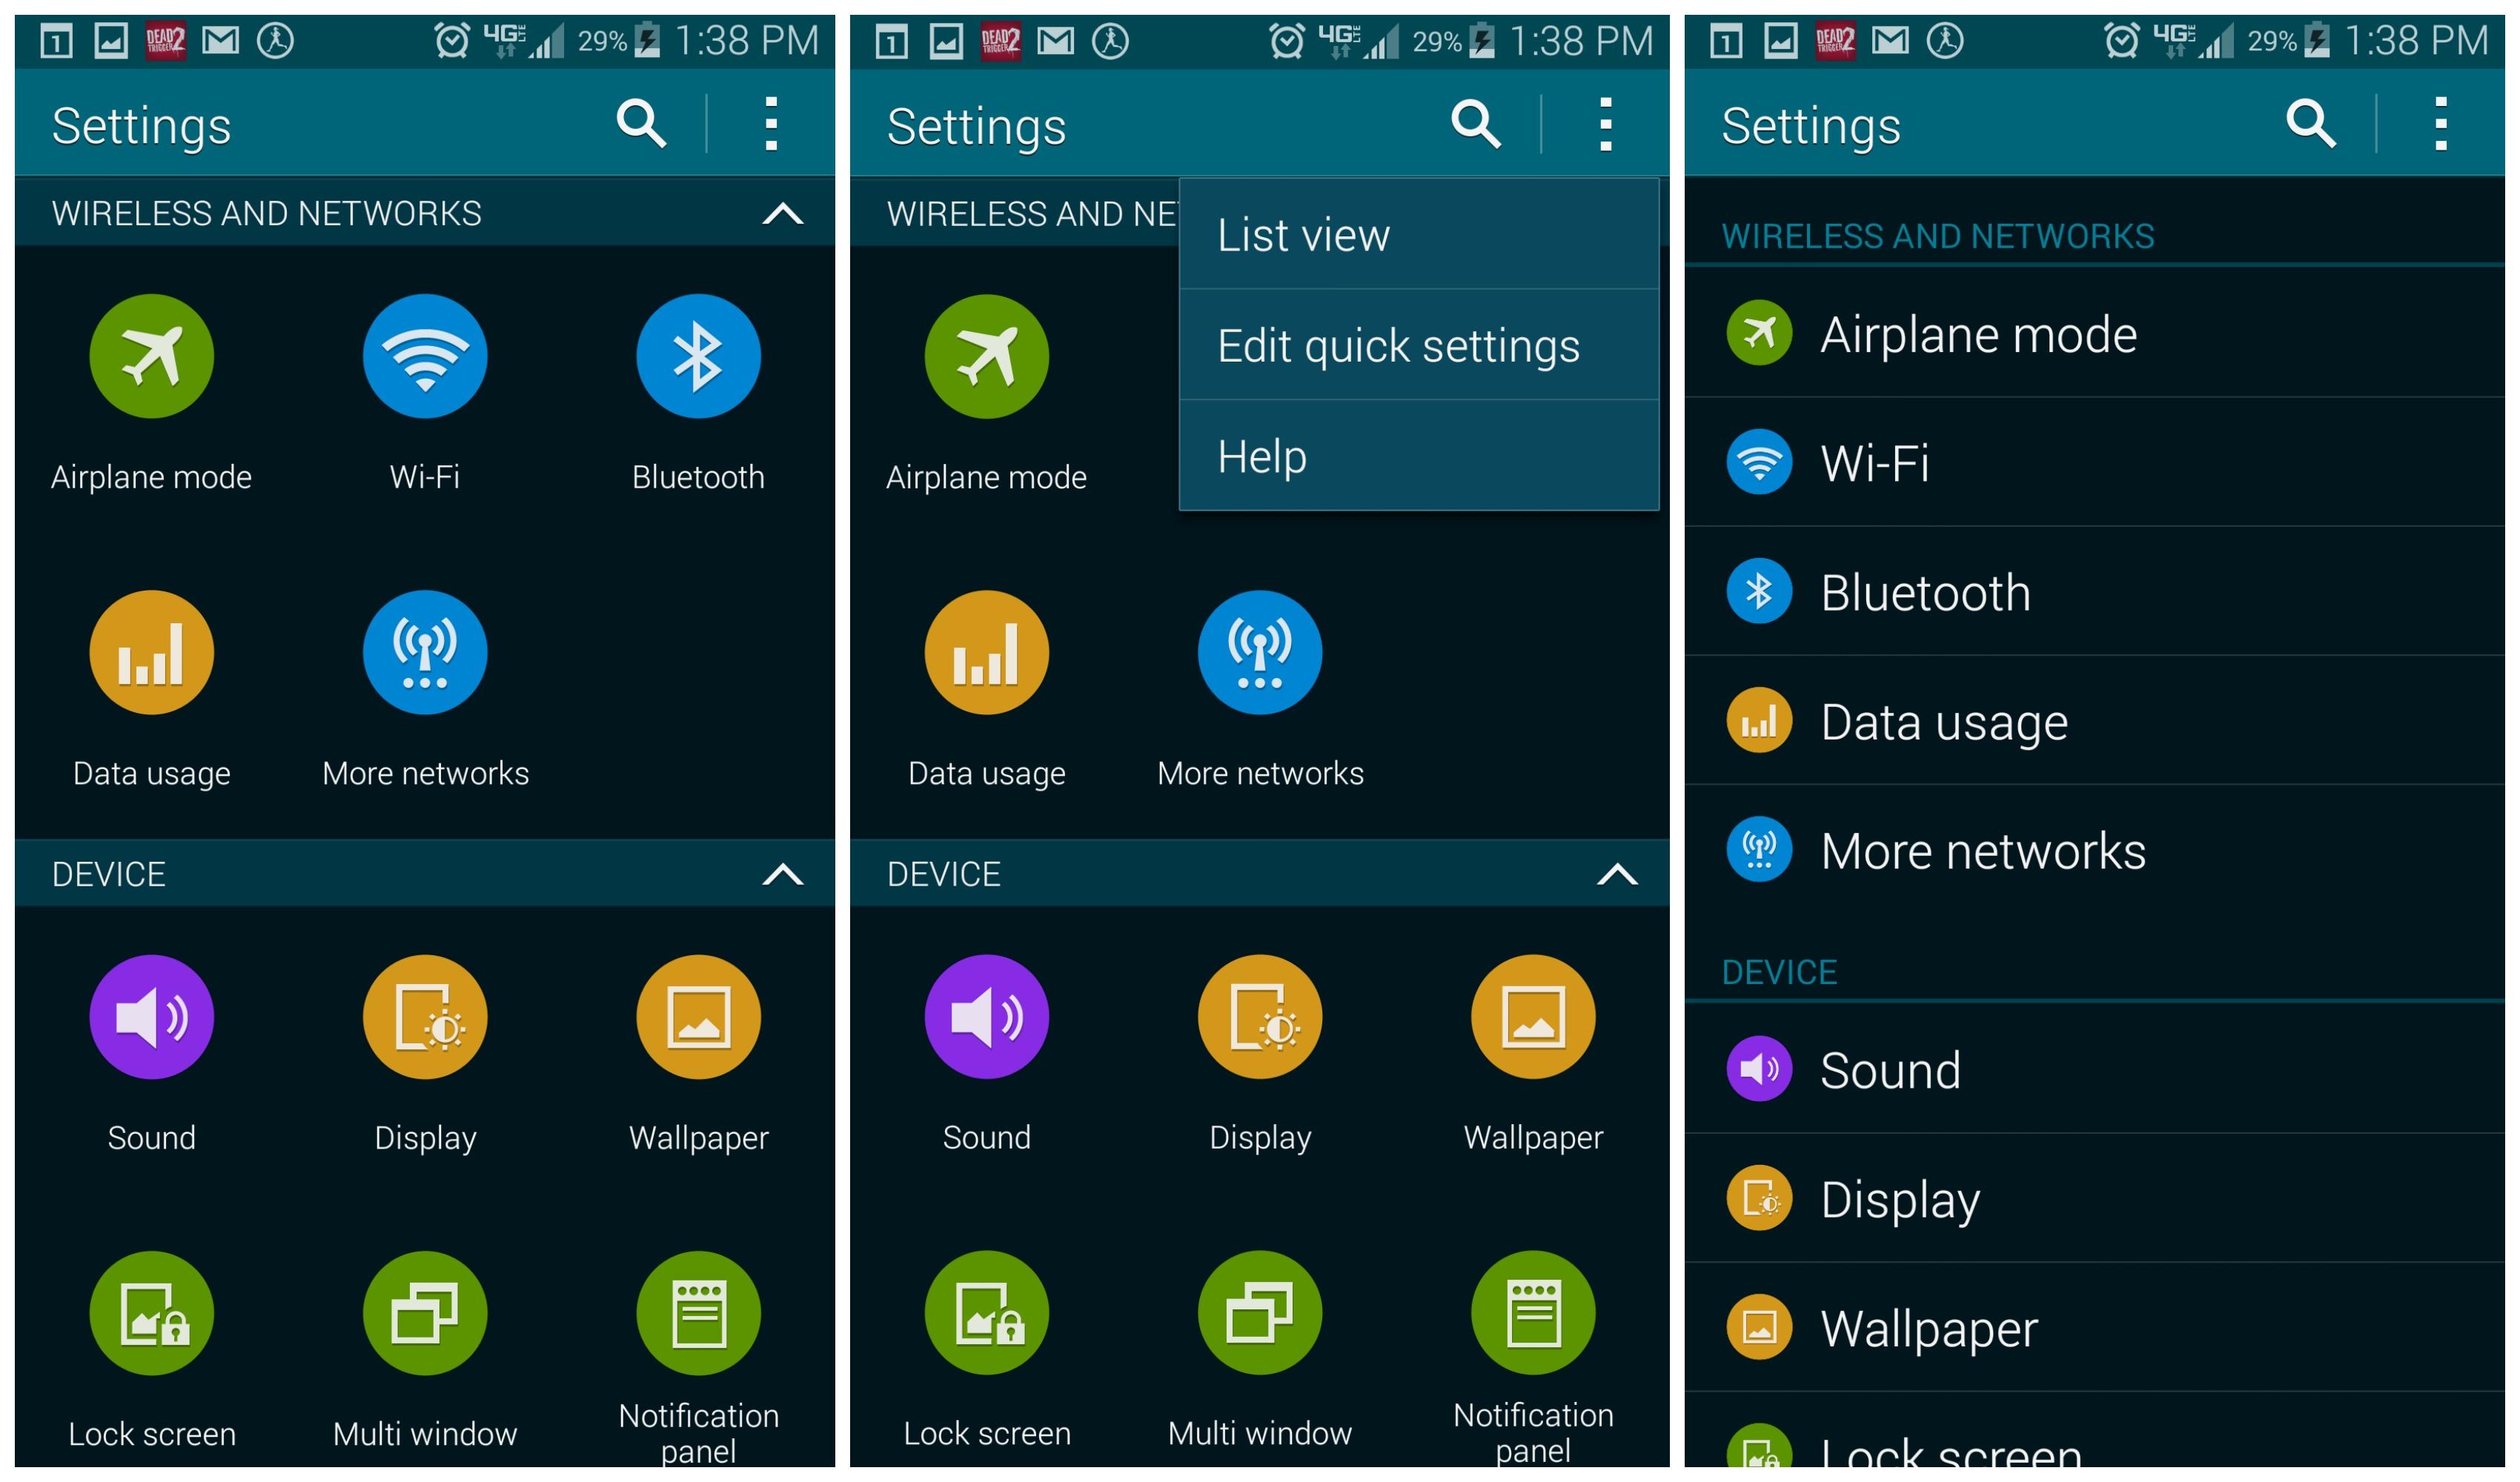 Galaxy-S5-Settings-list-view